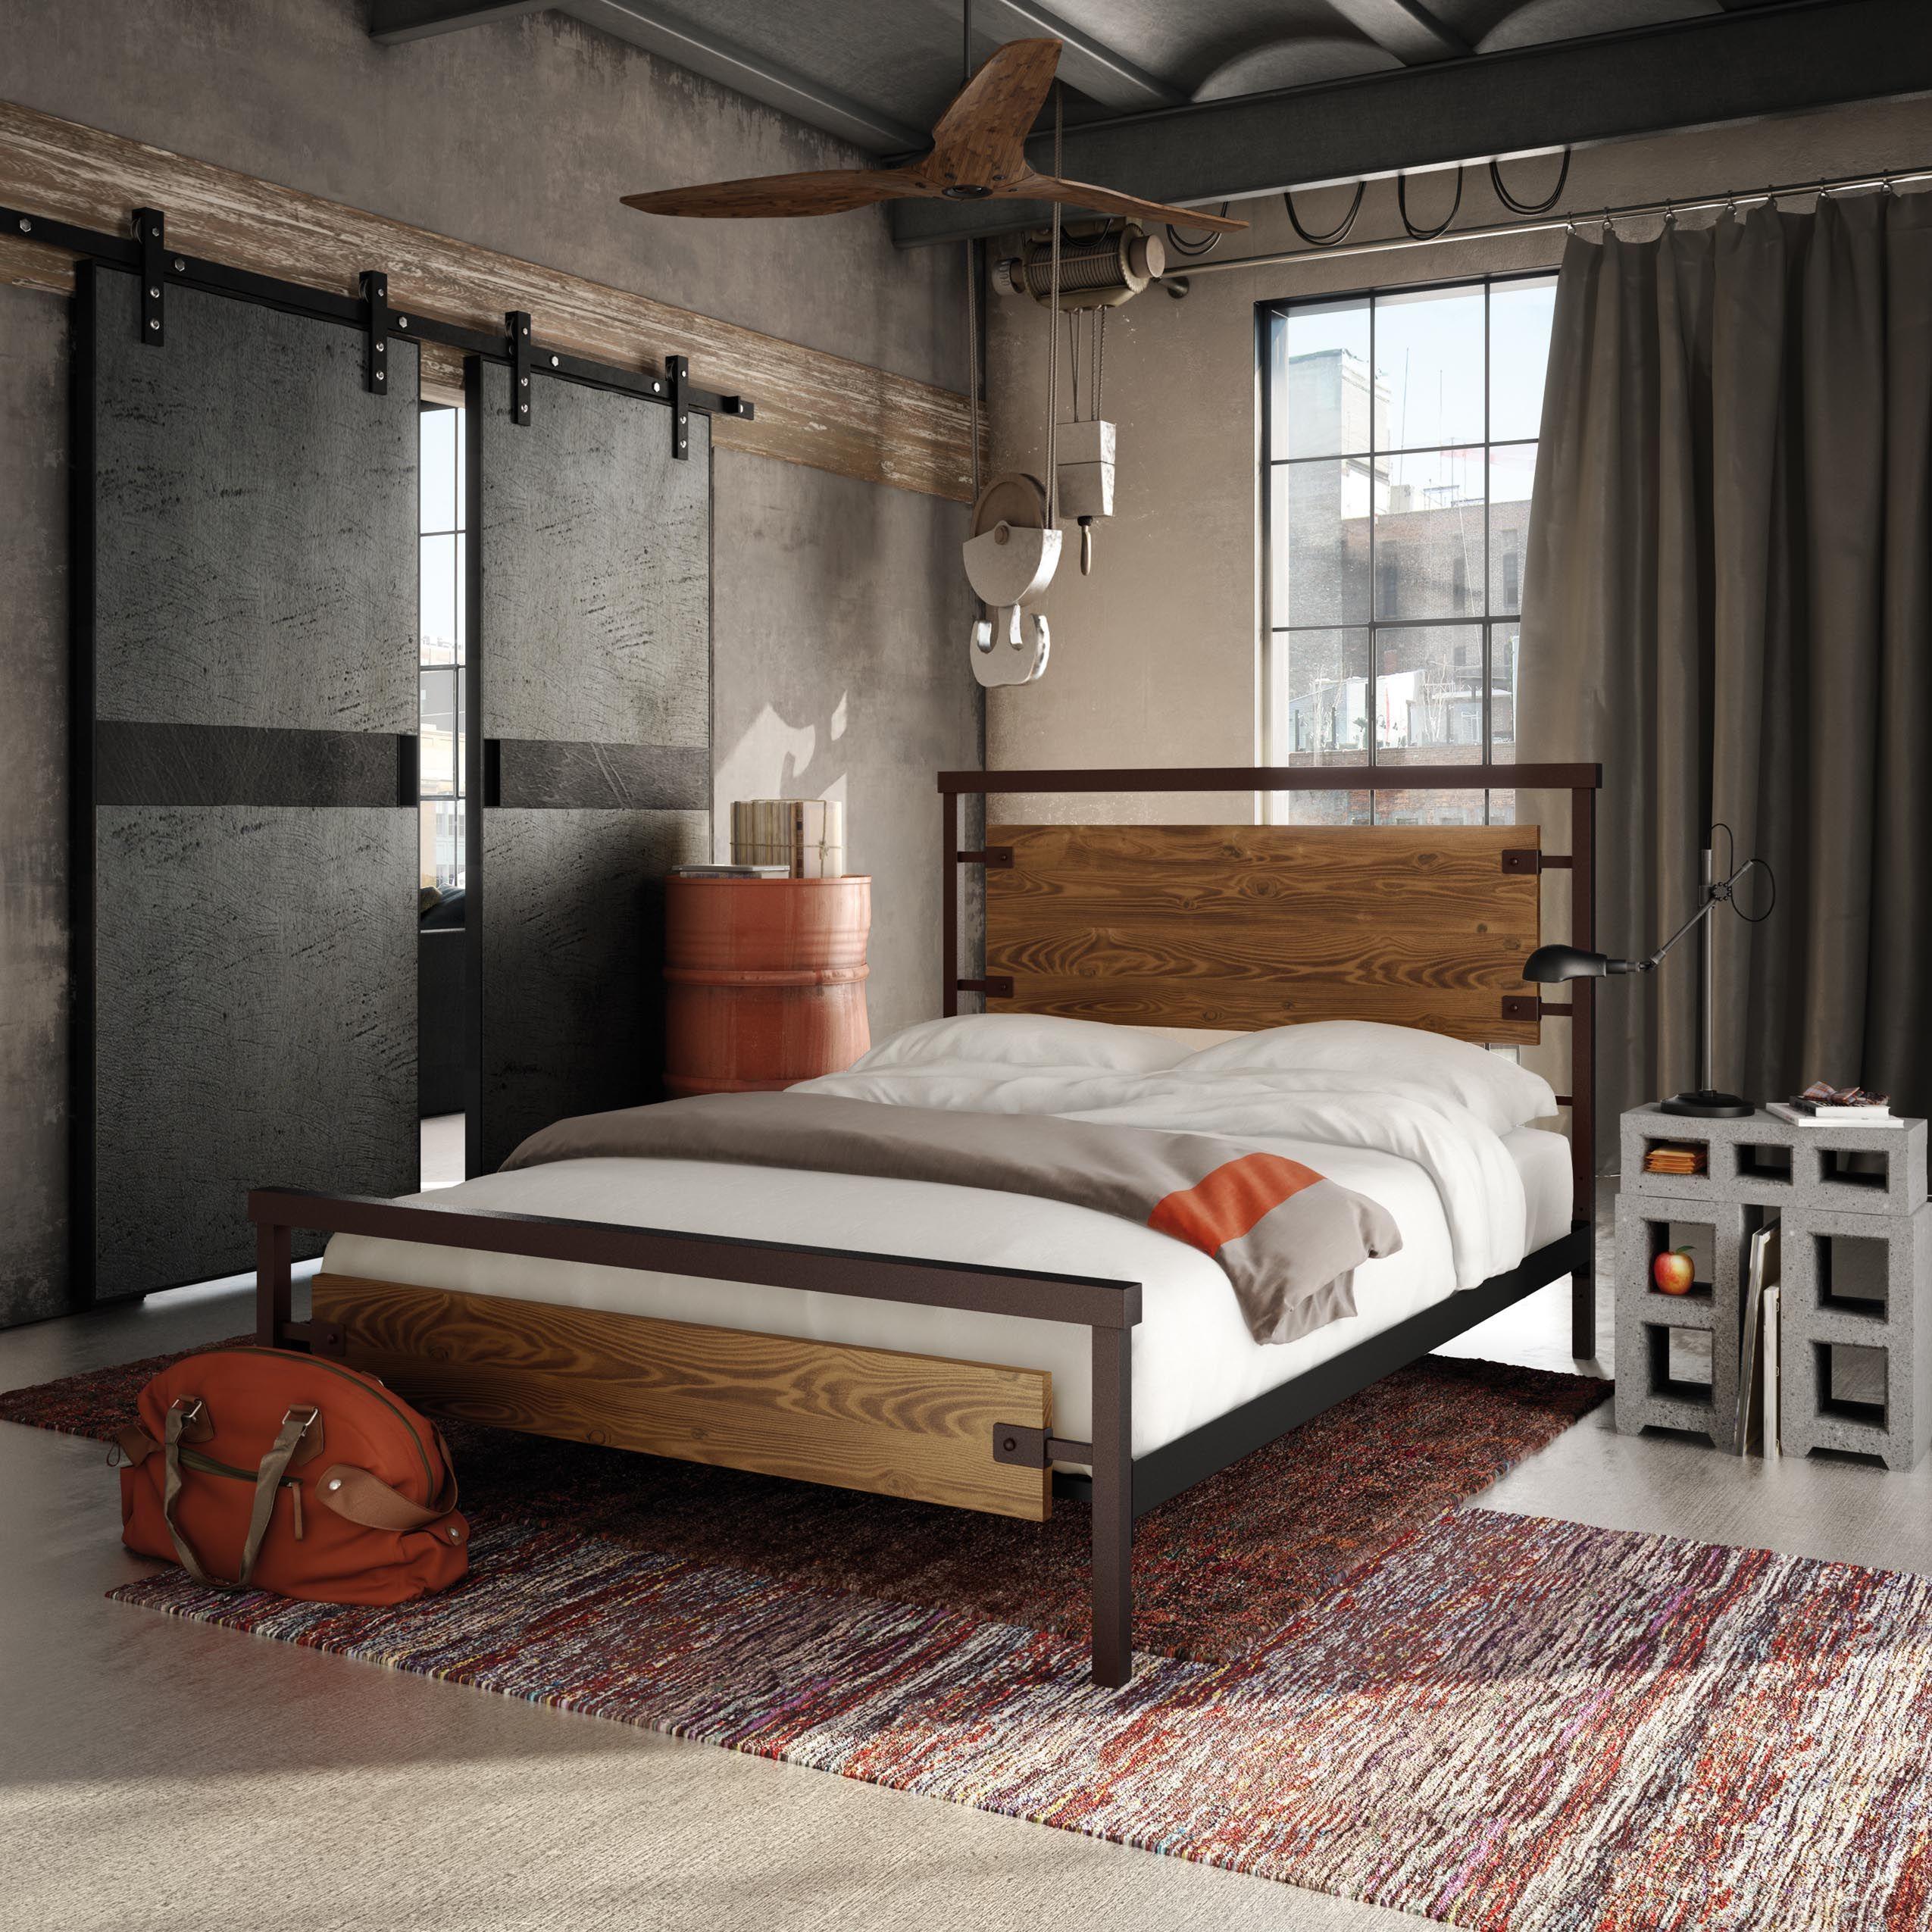 AMISCO - Factory Bed (12389) - Furniture - Bedroom - Industrial ...